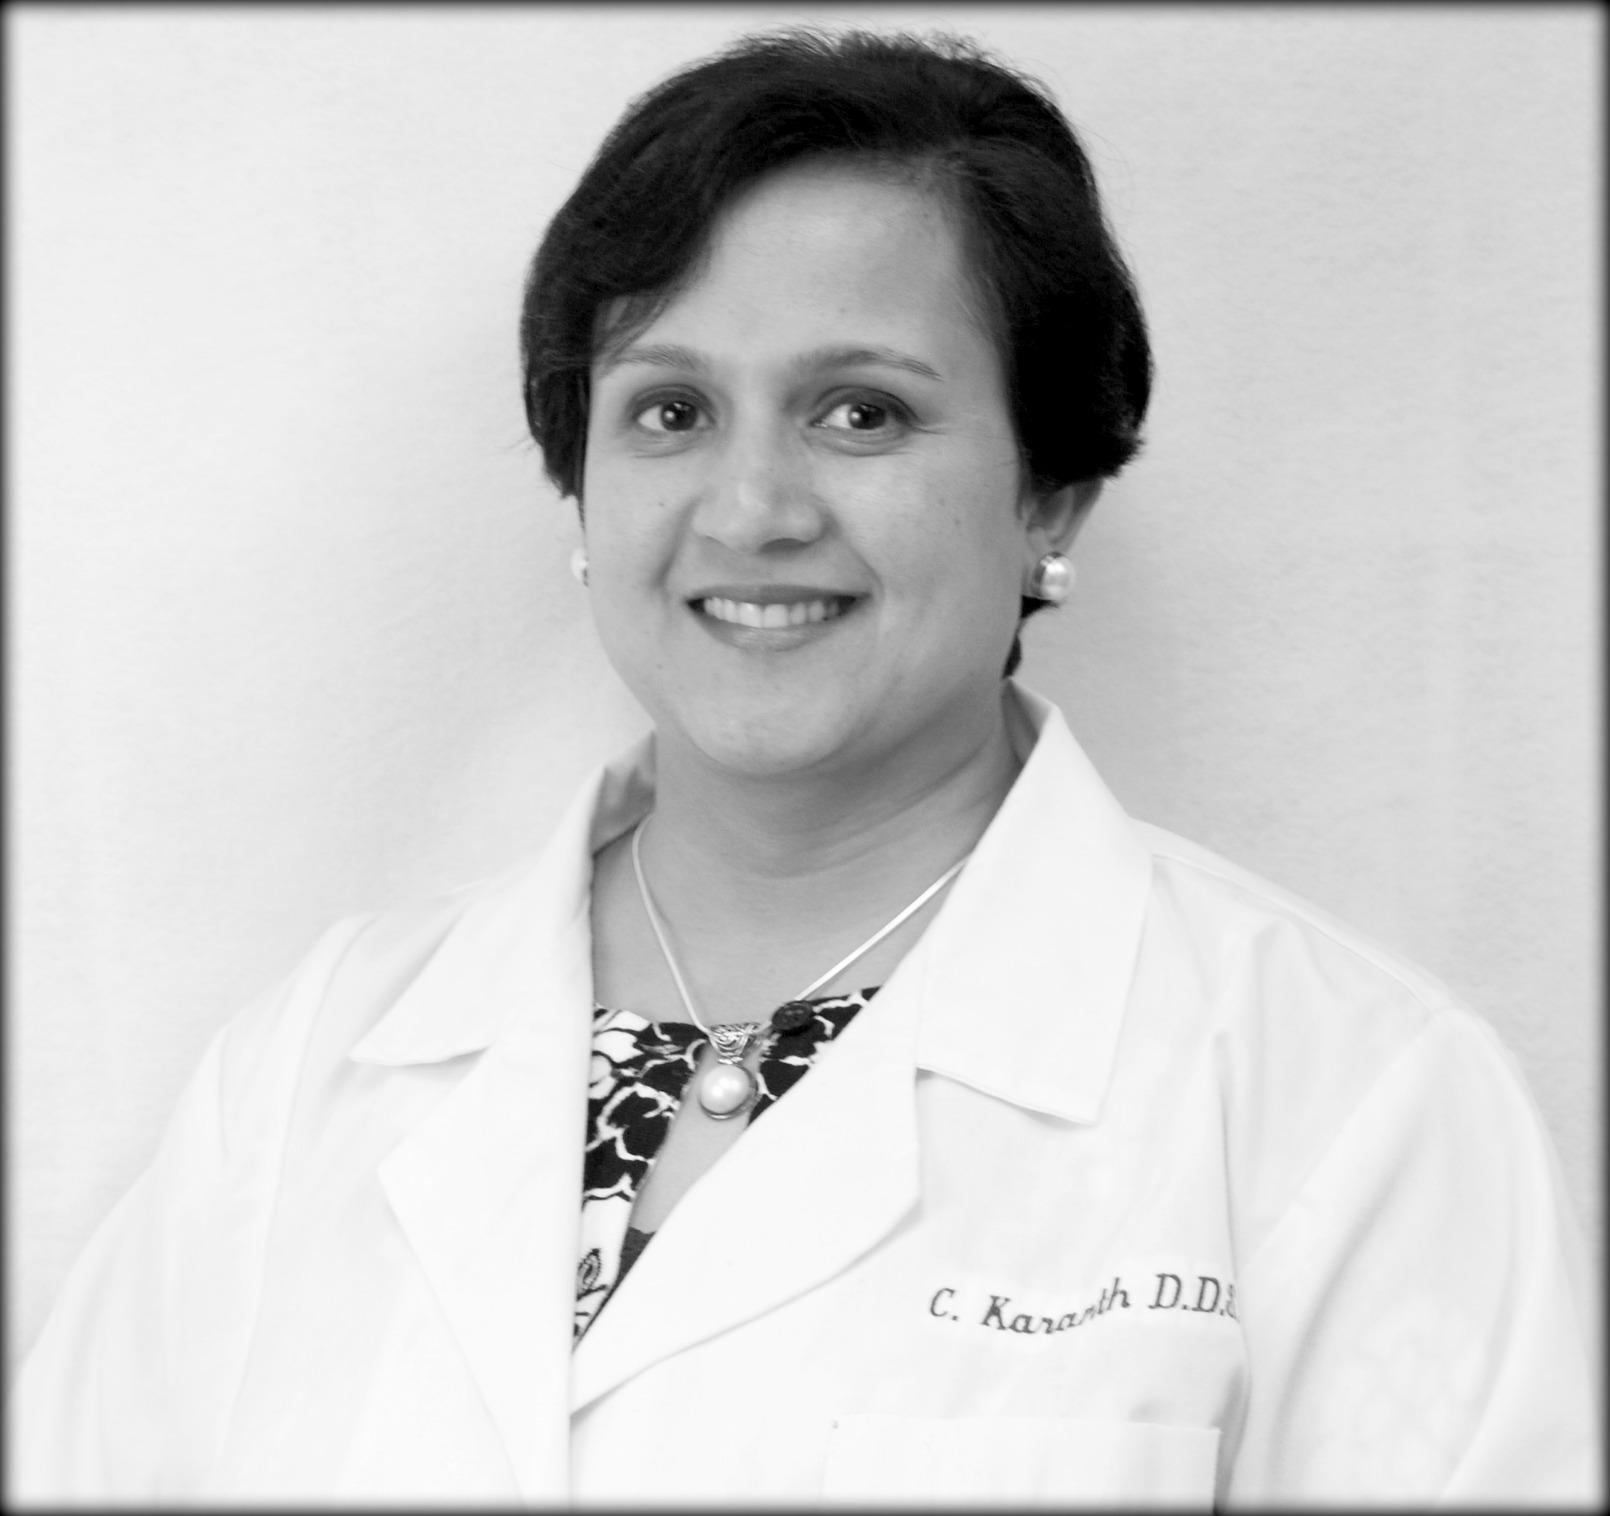 Dr. Karanth